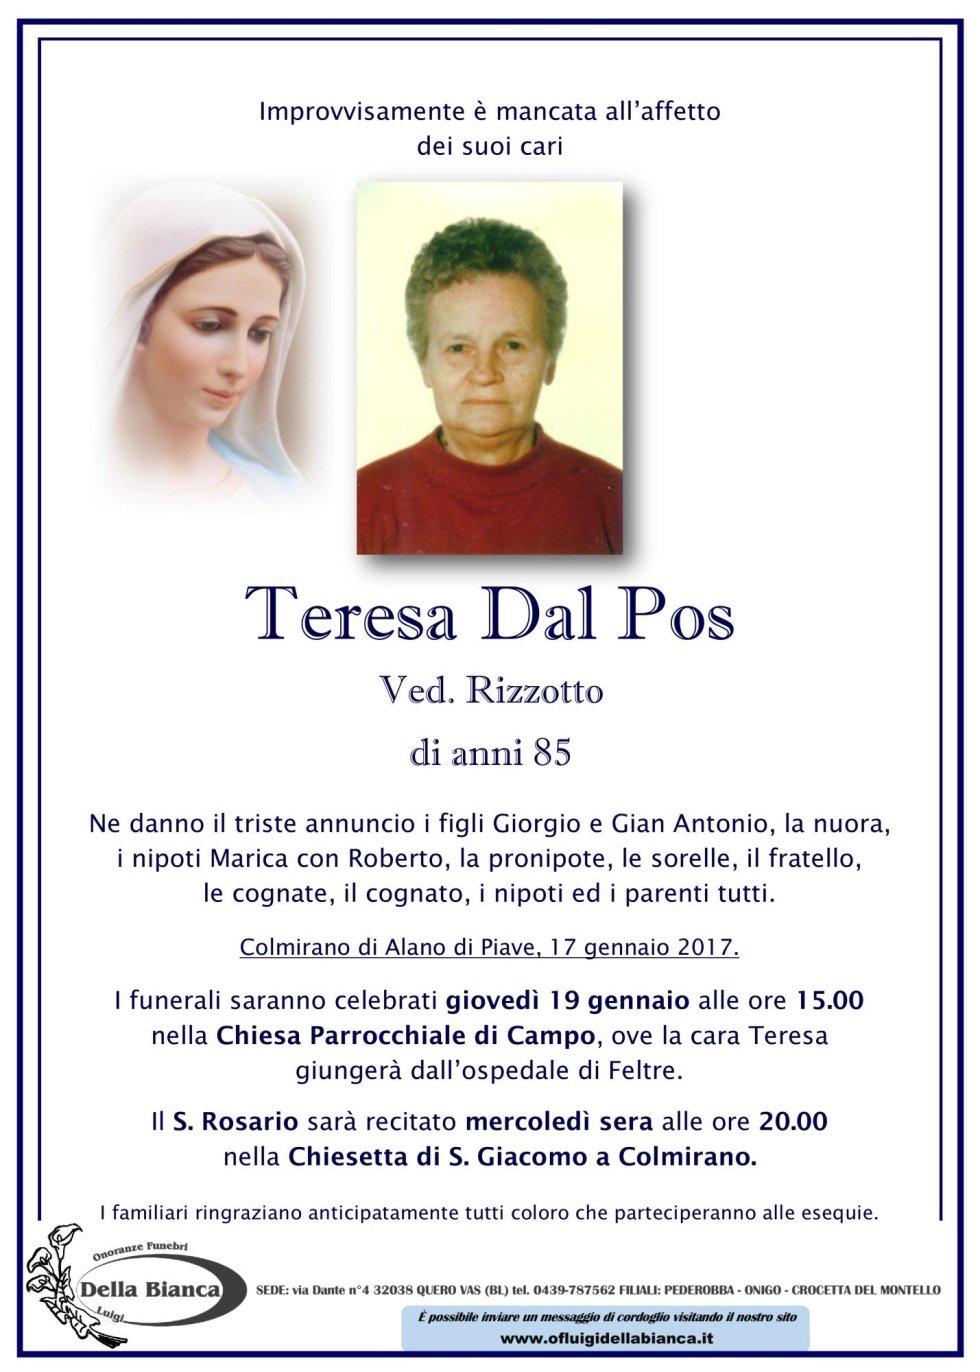 Dal Pos Teresa